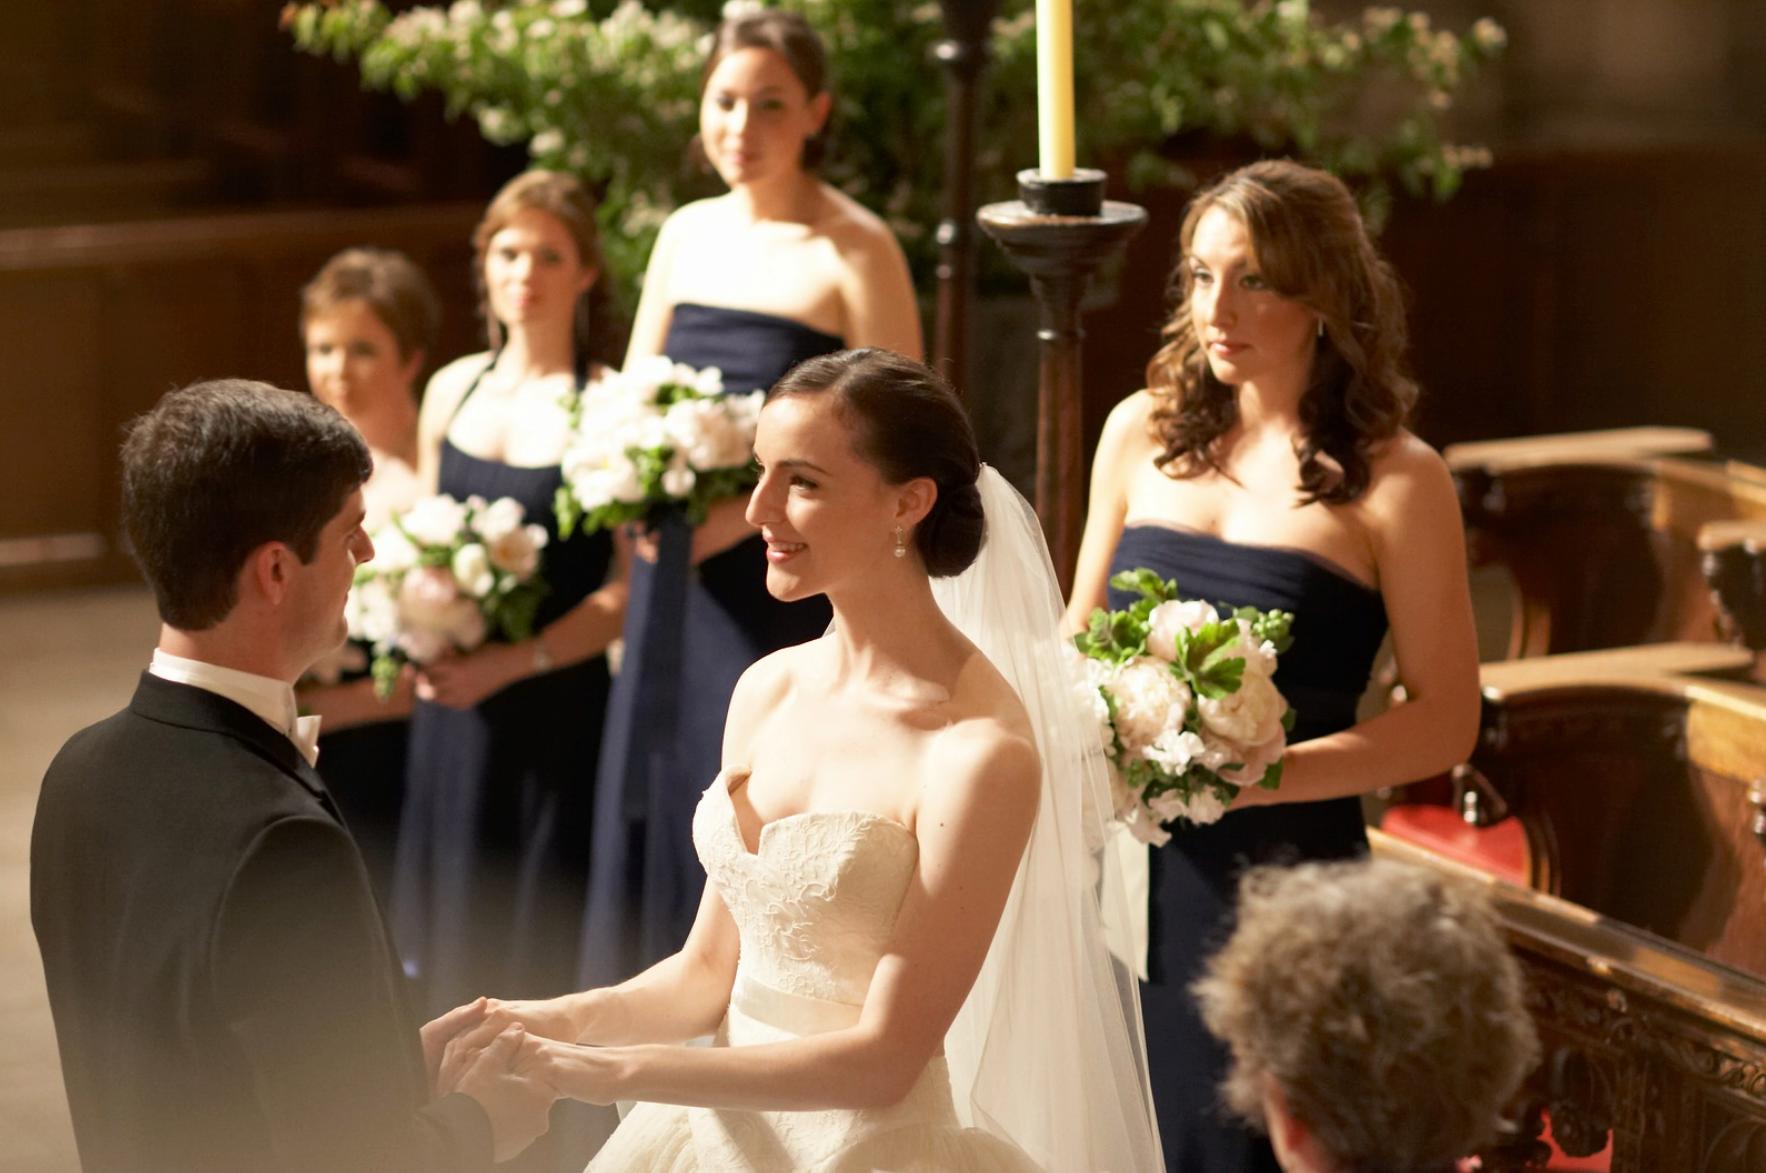 New-York-Portrait-Wedding-Family-Photographer-Tanya-Malott_0185_.PNG